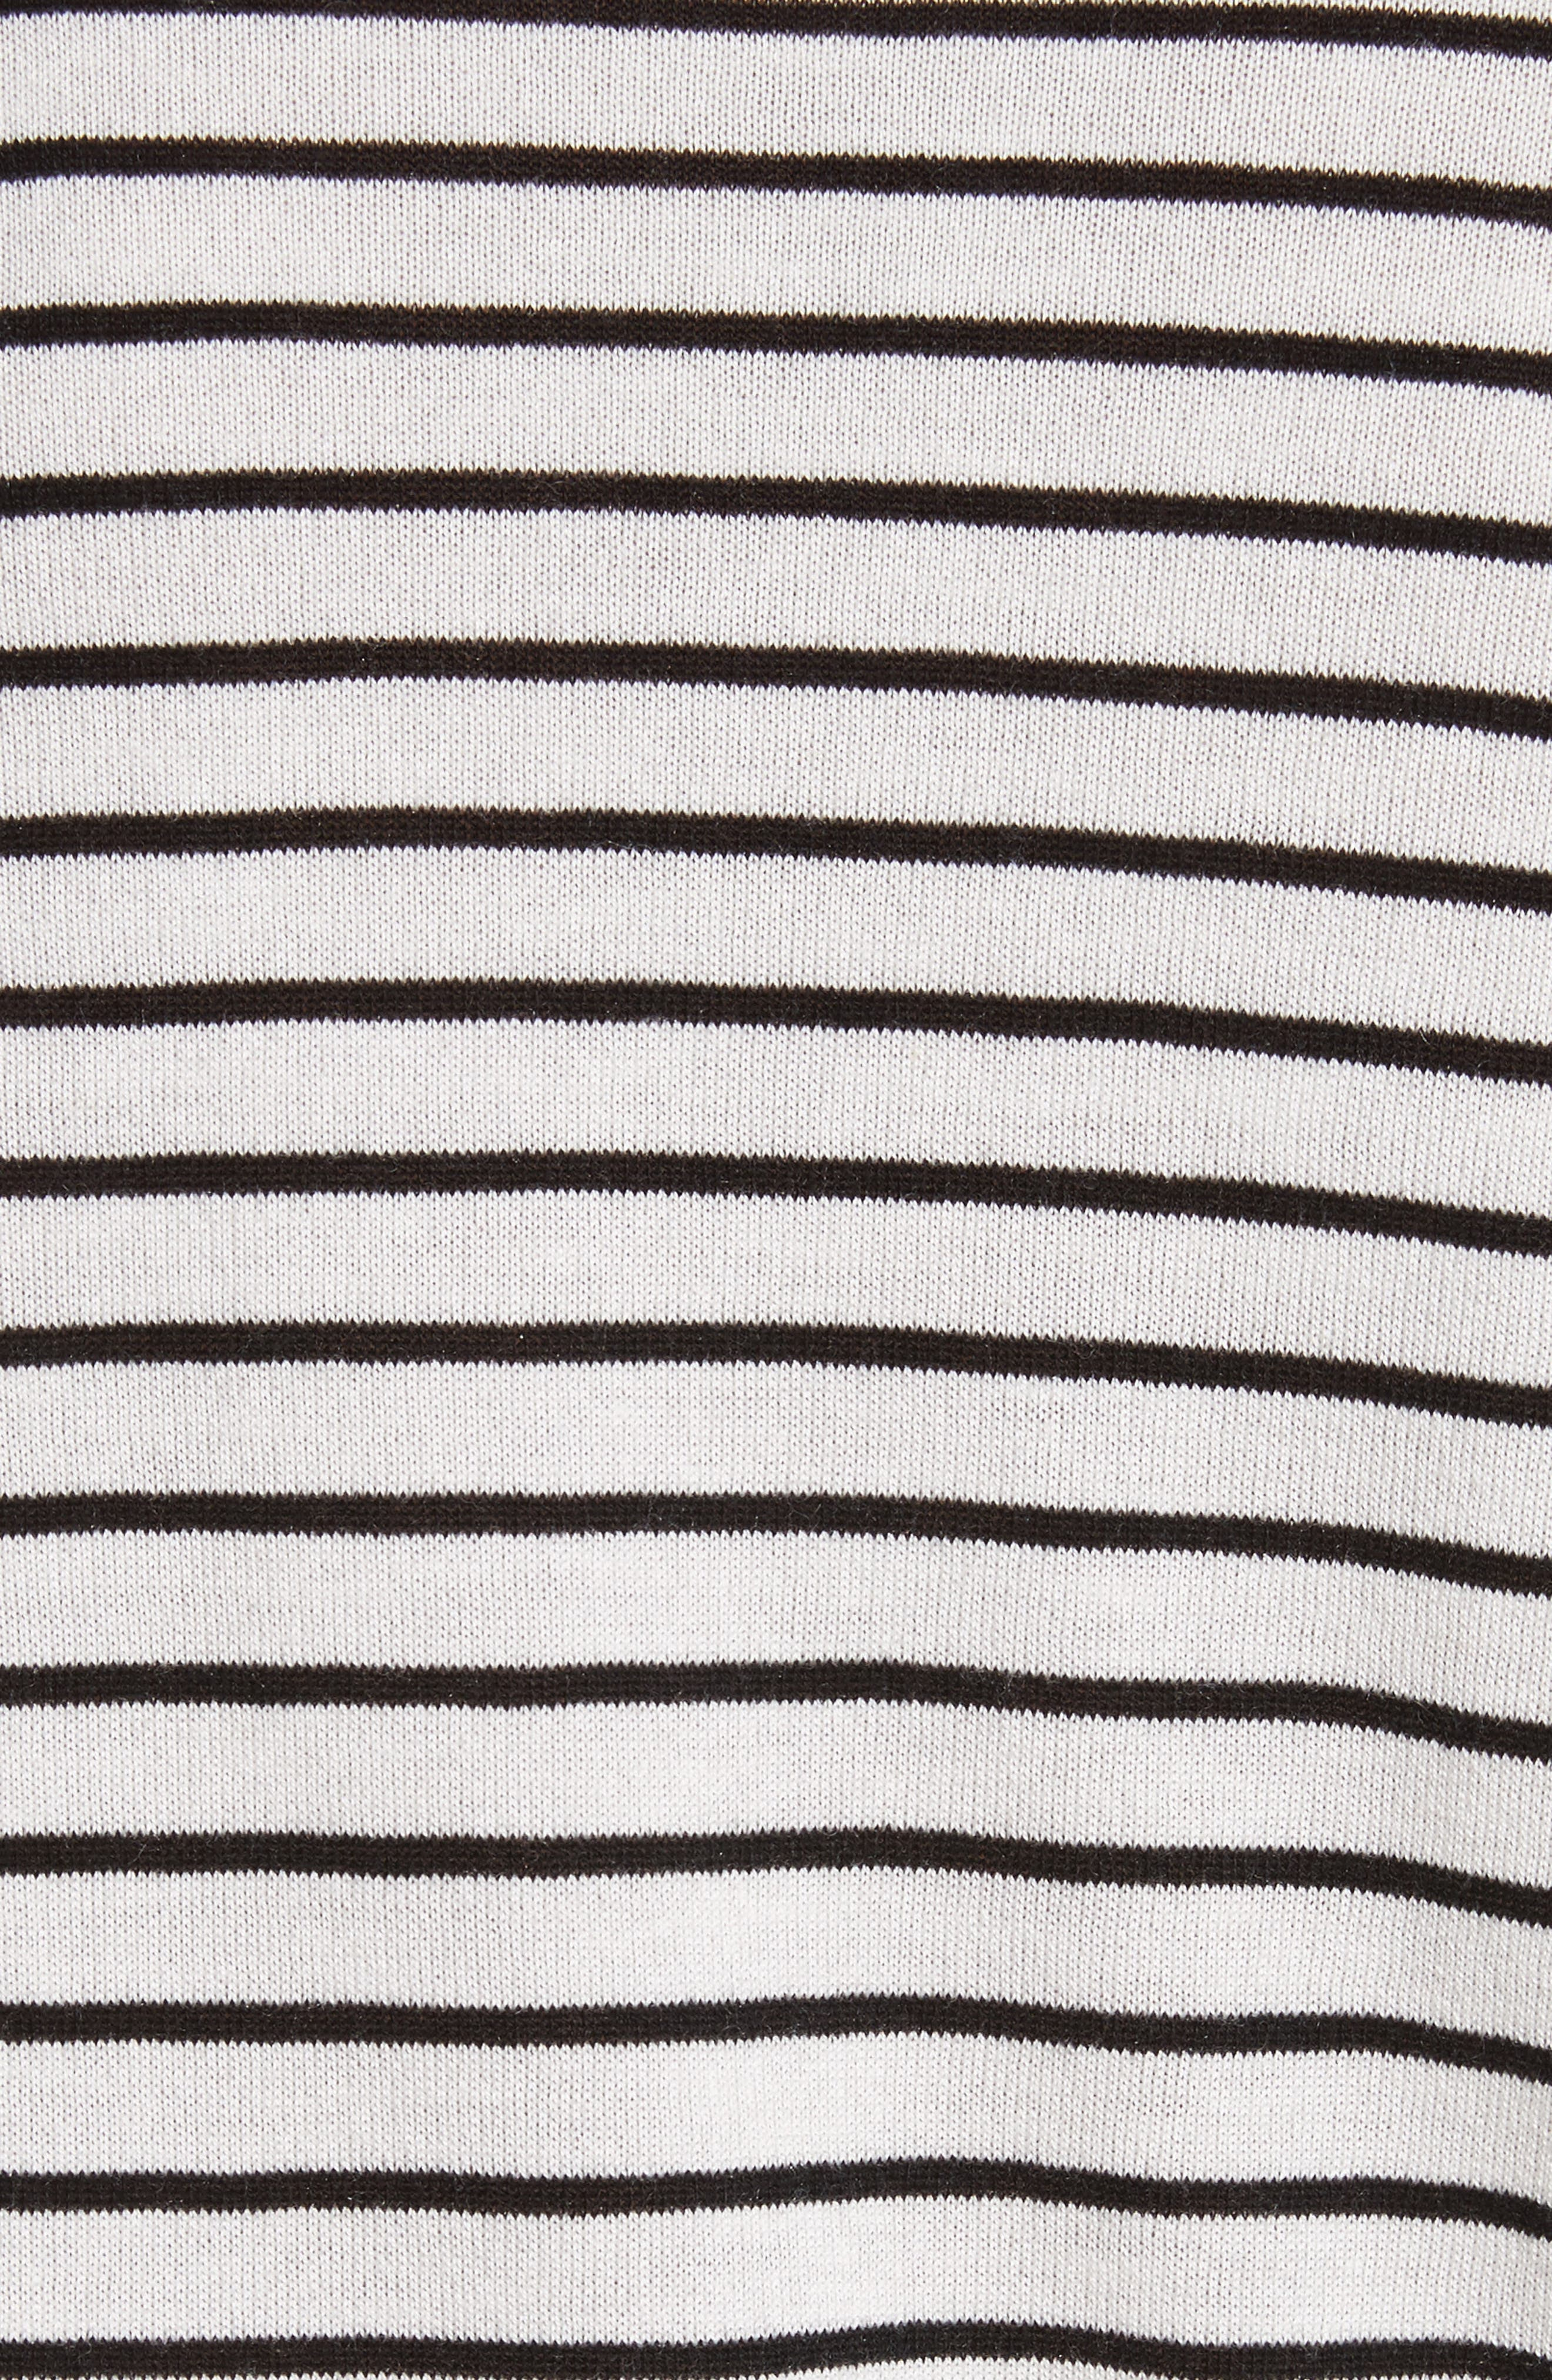 Stripe Silk Blend Sweater,                             Alternate thumbnail 5, color,                             107